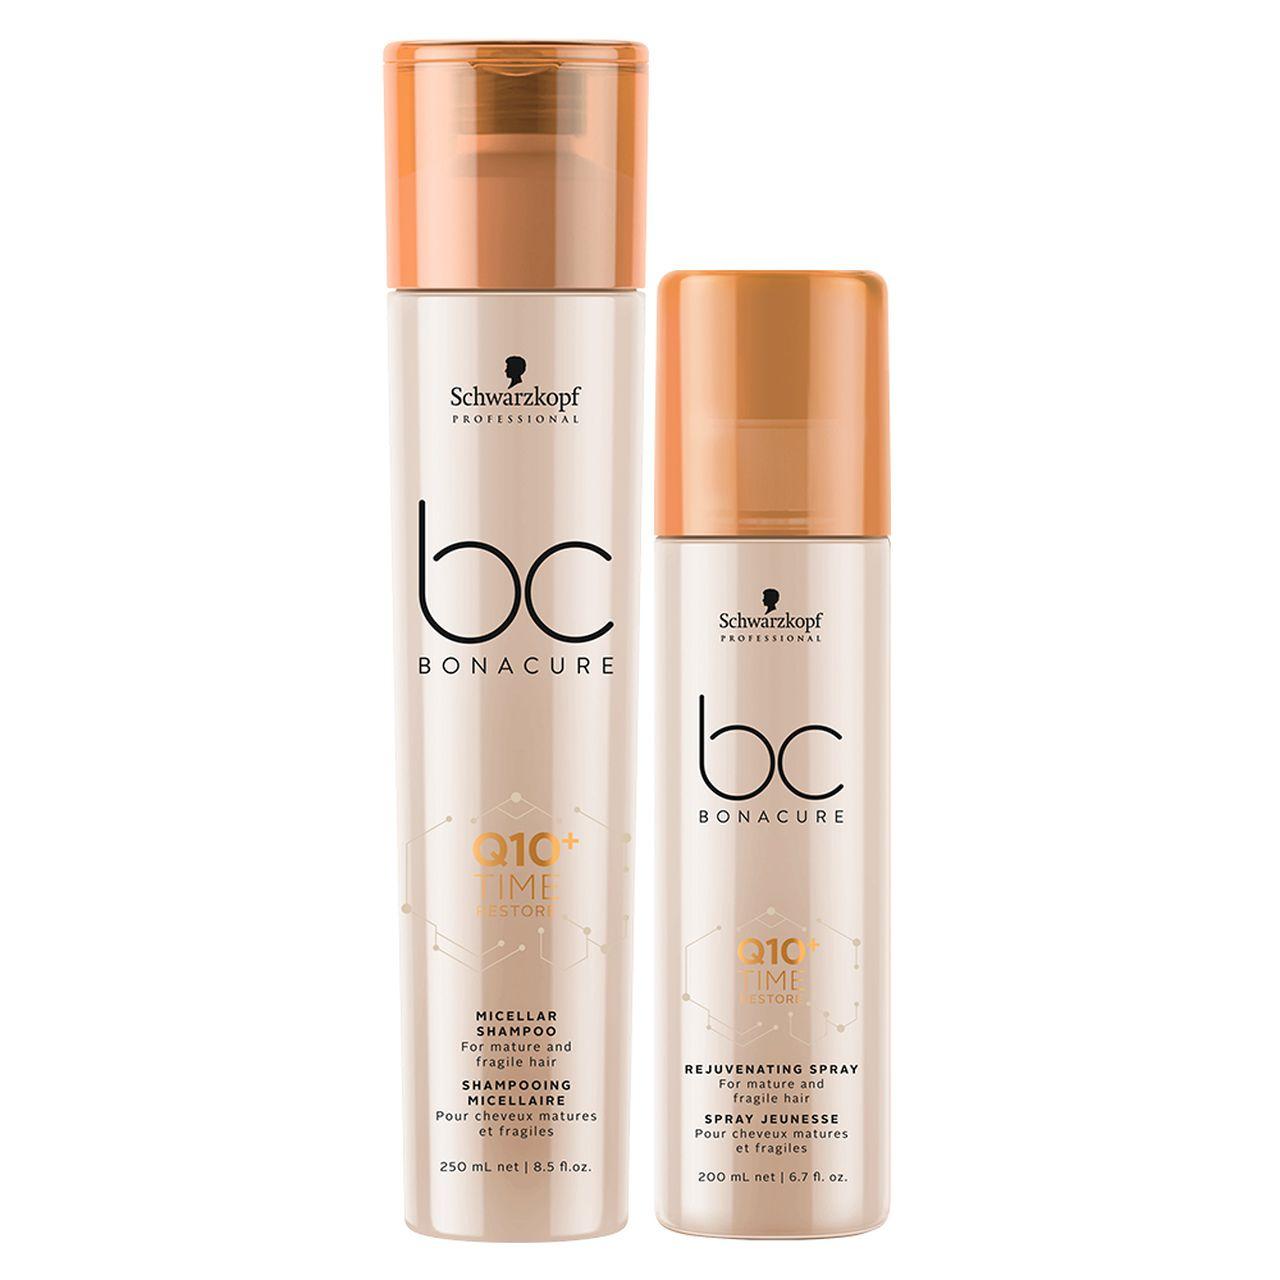 kit Time Restore - Shampoo Micellar + Condicionador Spray 200 ml